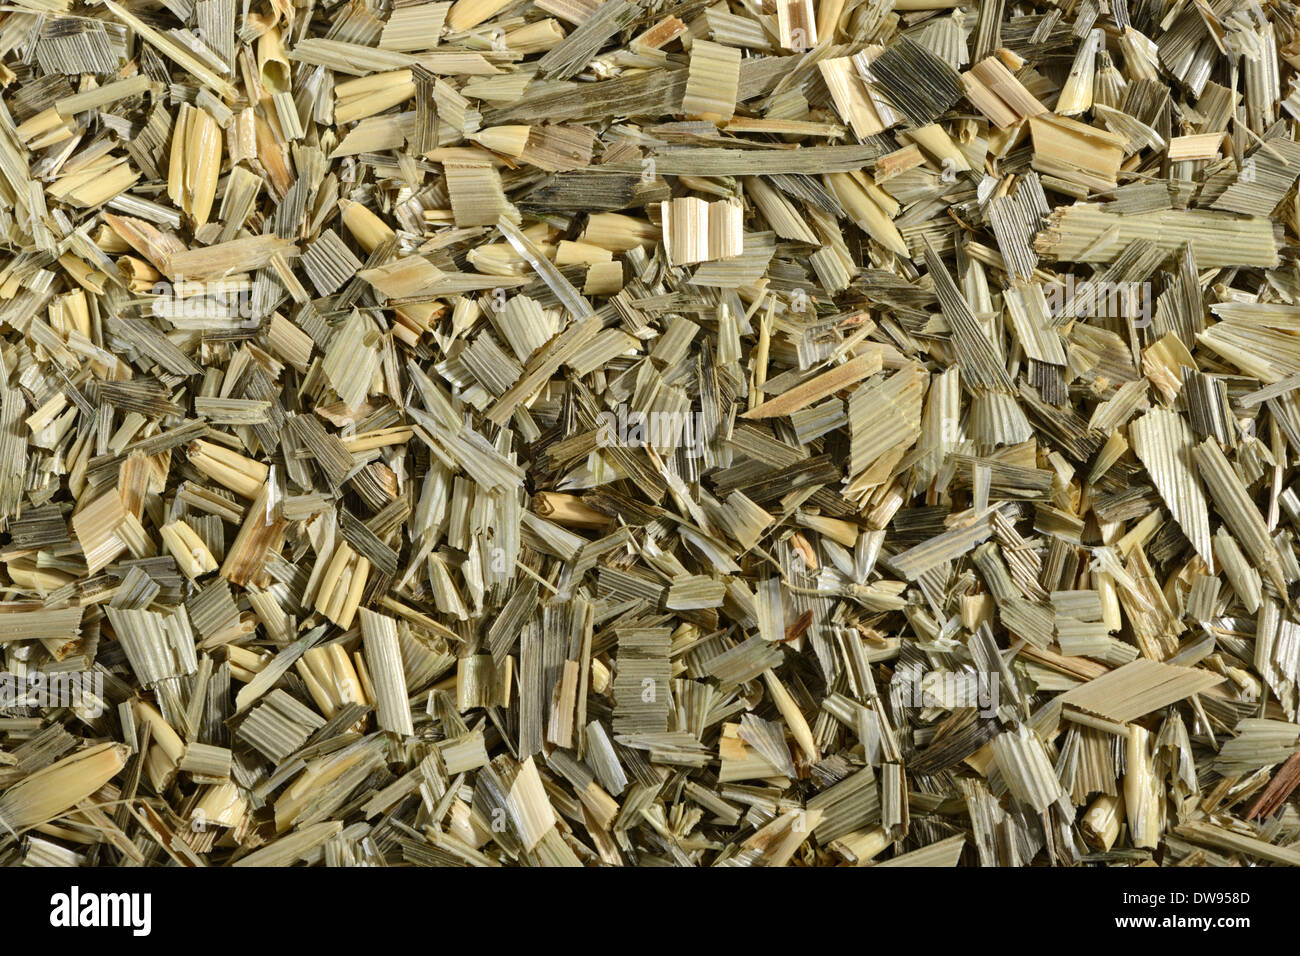 Oat straw - Stock Image